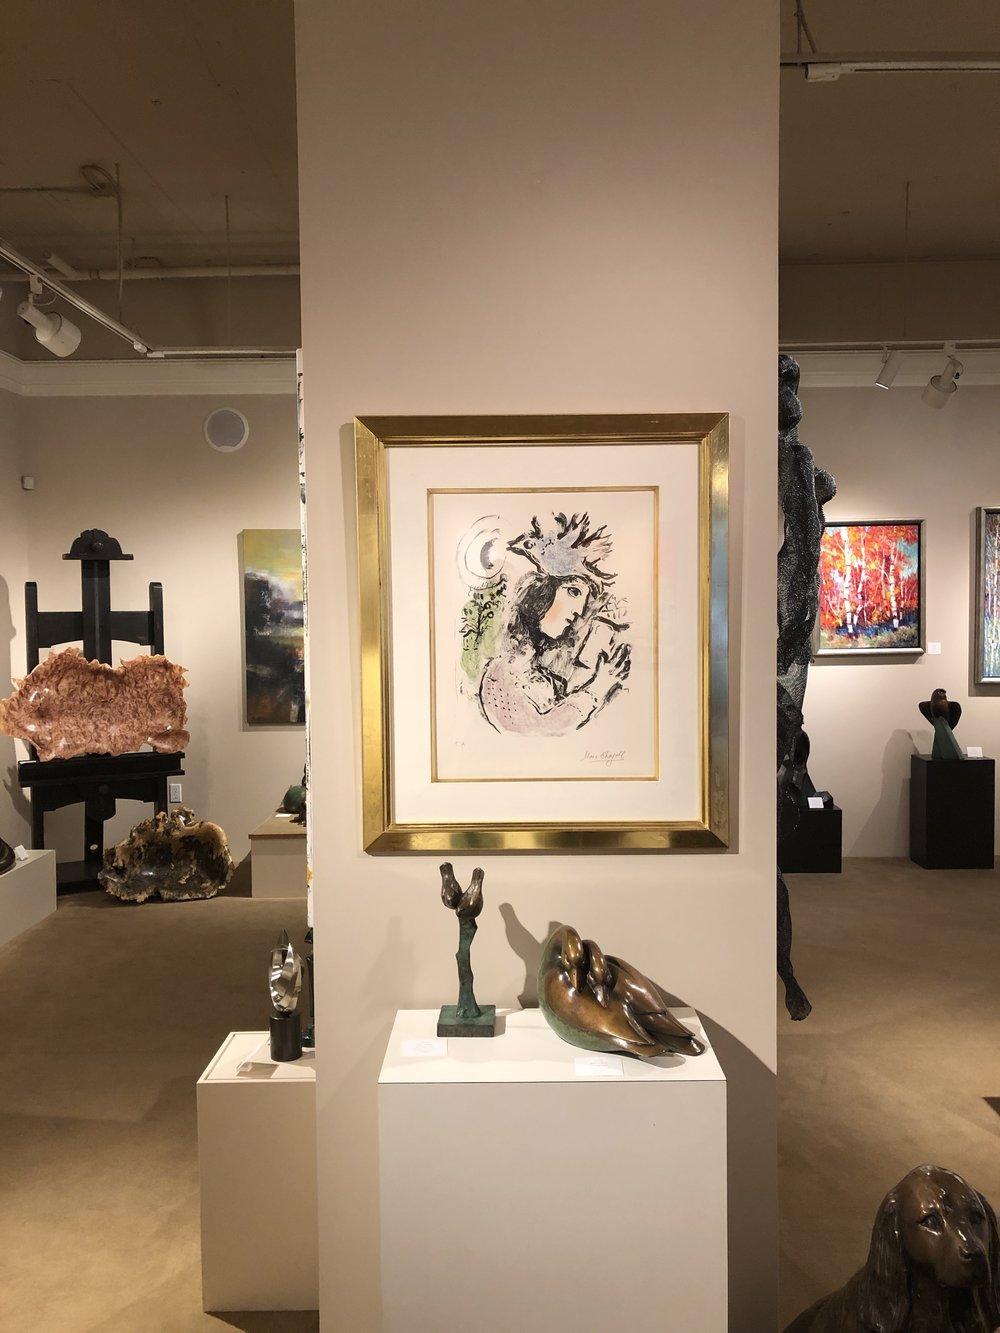 Hanging at Gallery Mack